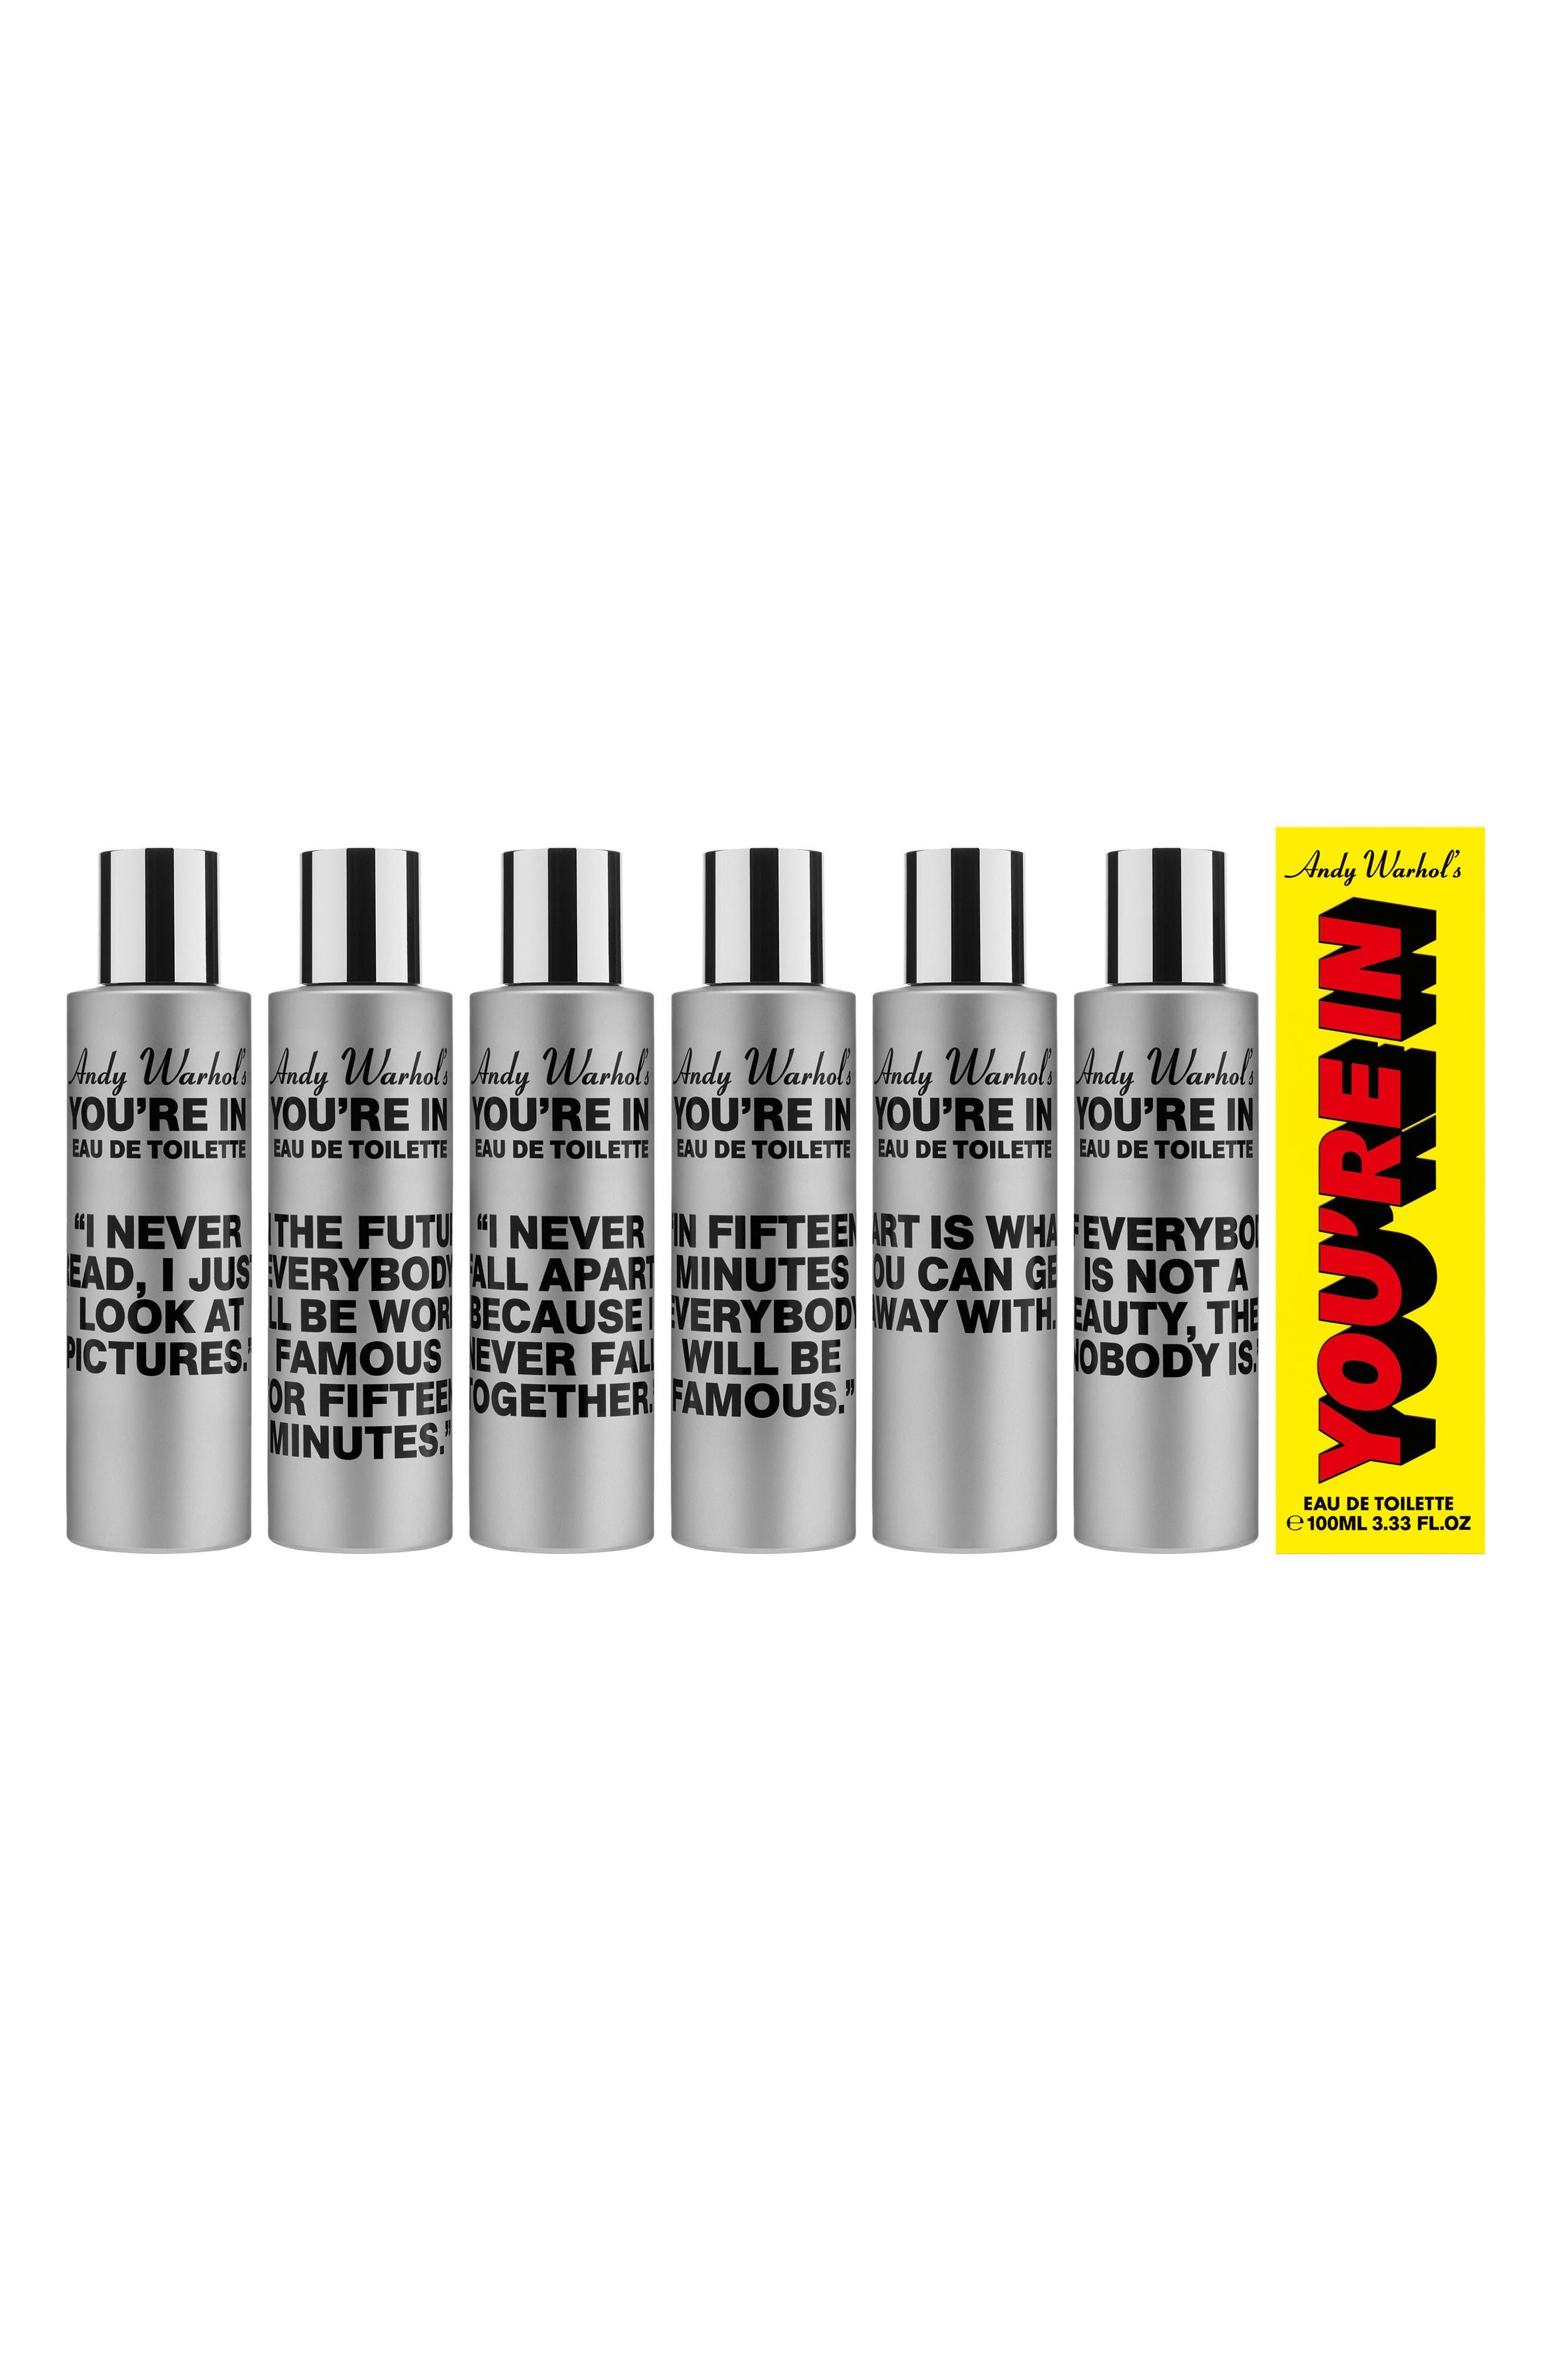 Andy Warhol You're In Unisex Eau de Toilette,                             Alternate thumbnail 4, color,                             In Fifteen Minutes